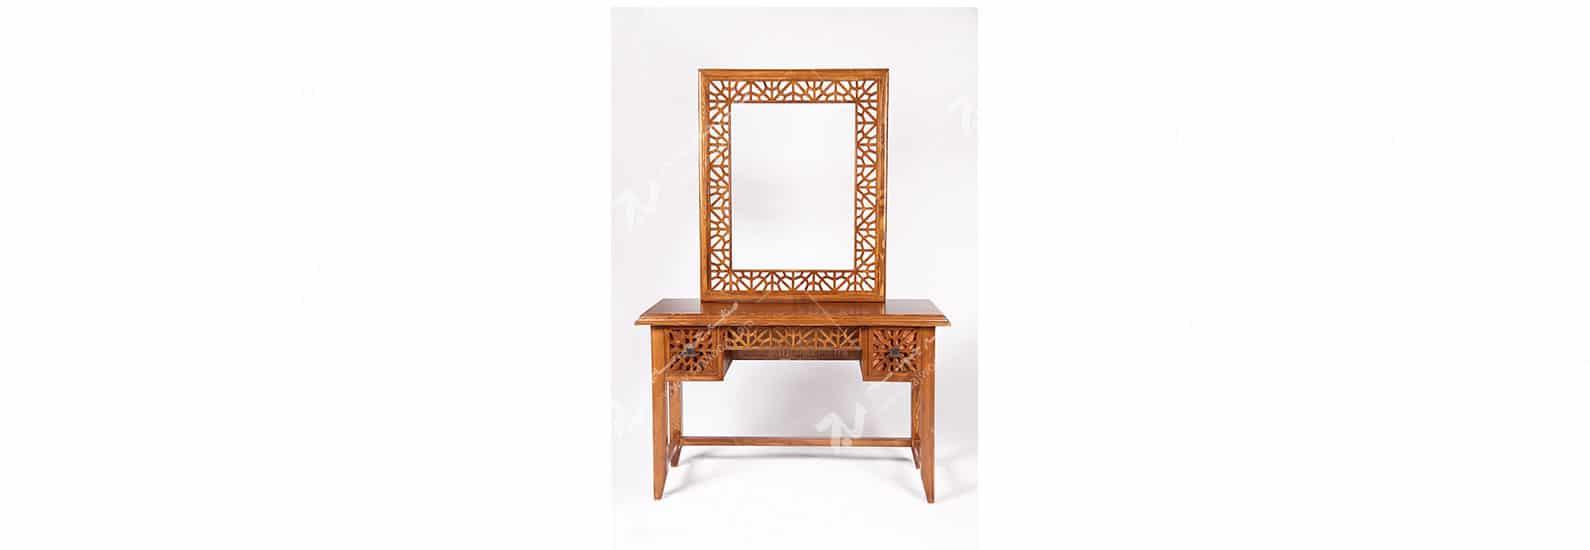 آیینه کنسول (میز آرایش ) دراور دکوراتیو چوبی سنتی گره چینی مشبک